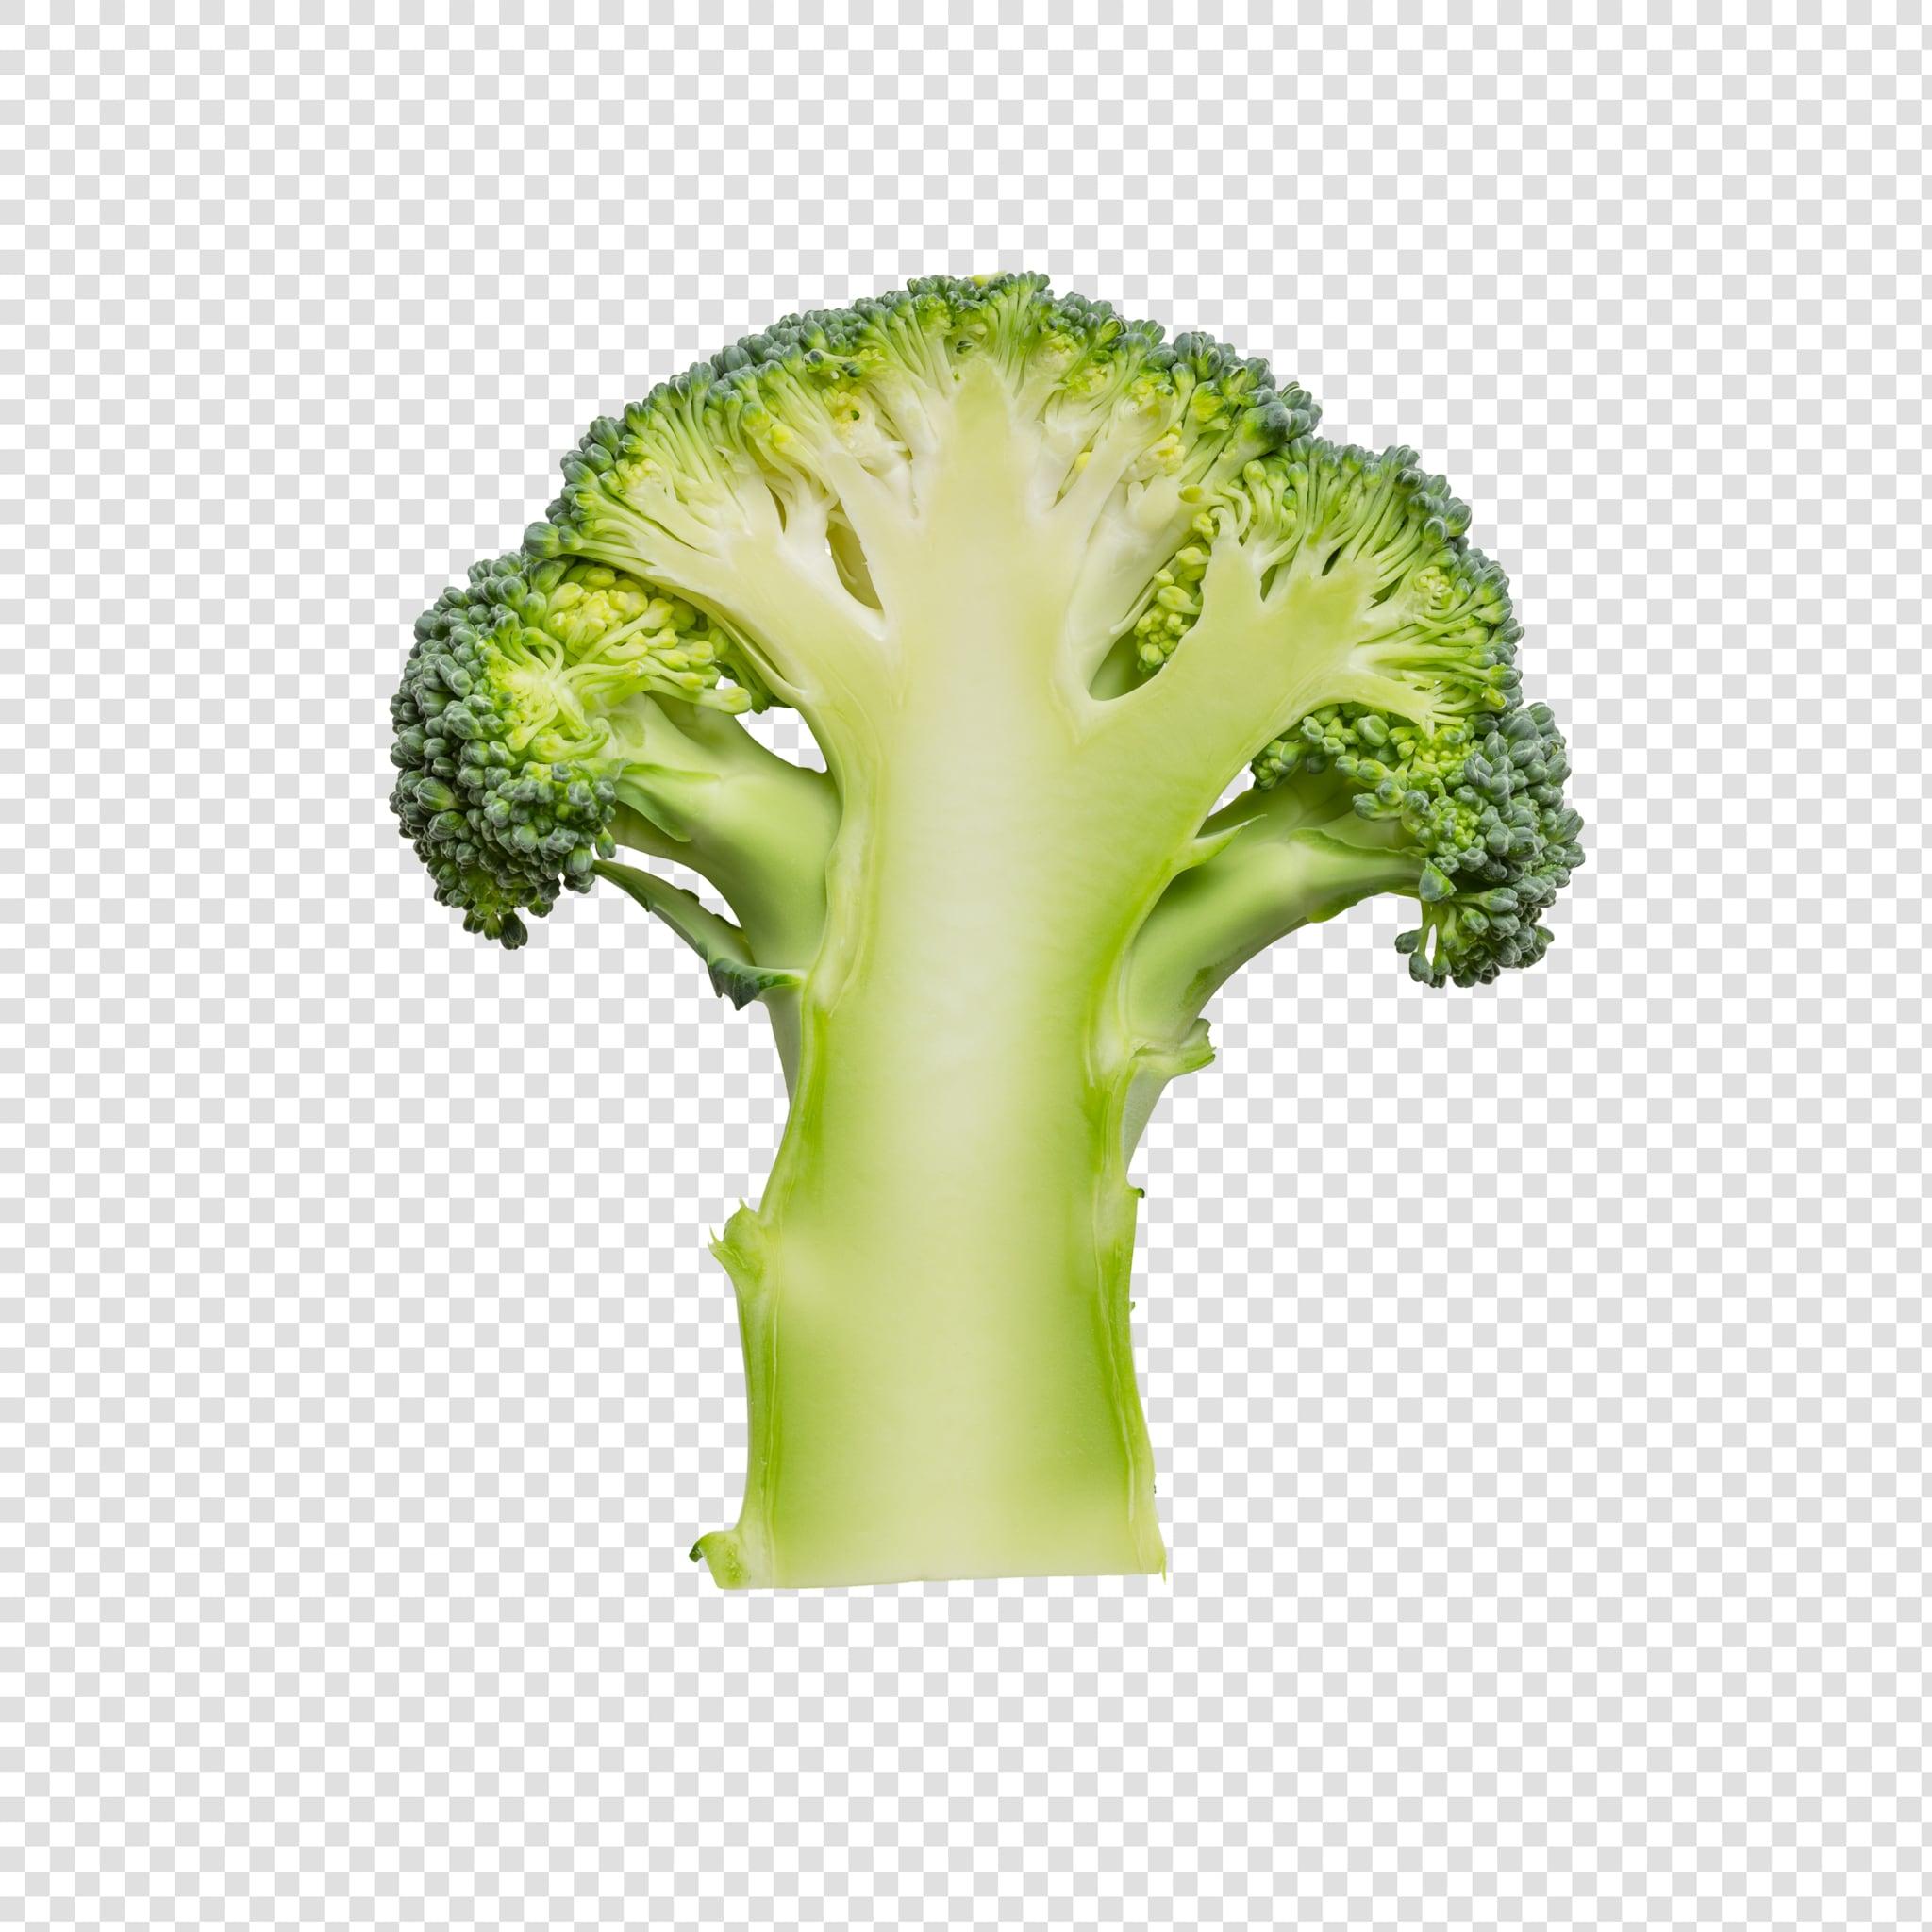 Isolated Broccoli psd image